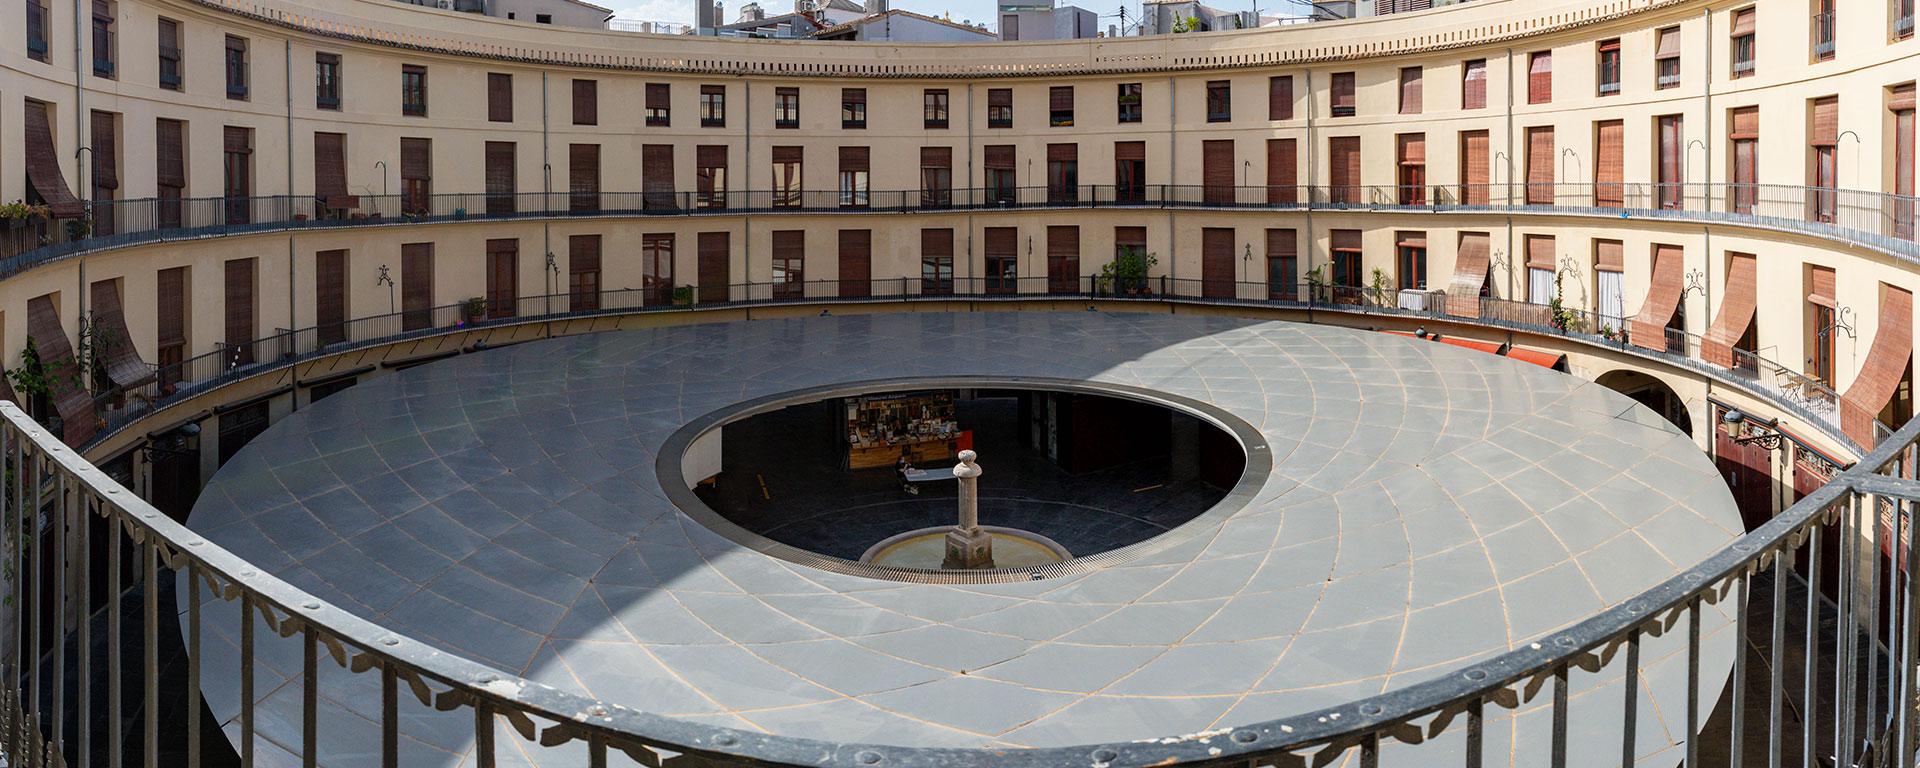 Posicion-7---plaza-redonda